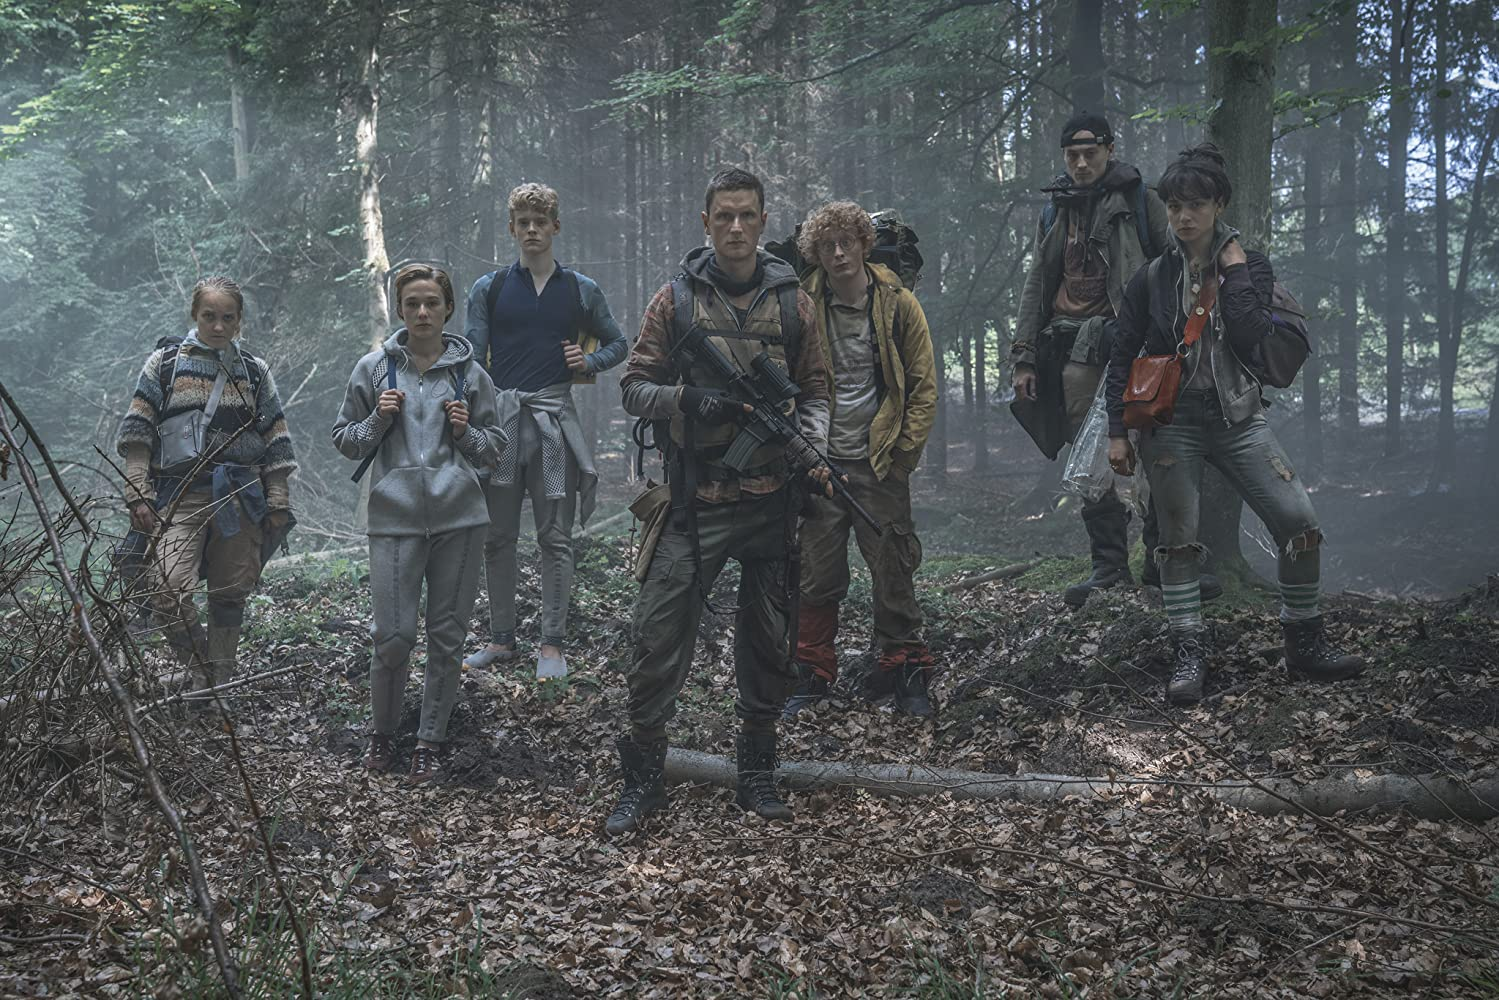 Alba August, Angela Bundalovic, Mikkel Boe Følsgaard, Lucas Lynggaard Tønnesen, Sonny Lindberg, and Jessica Dinnage in The Rain (2018)